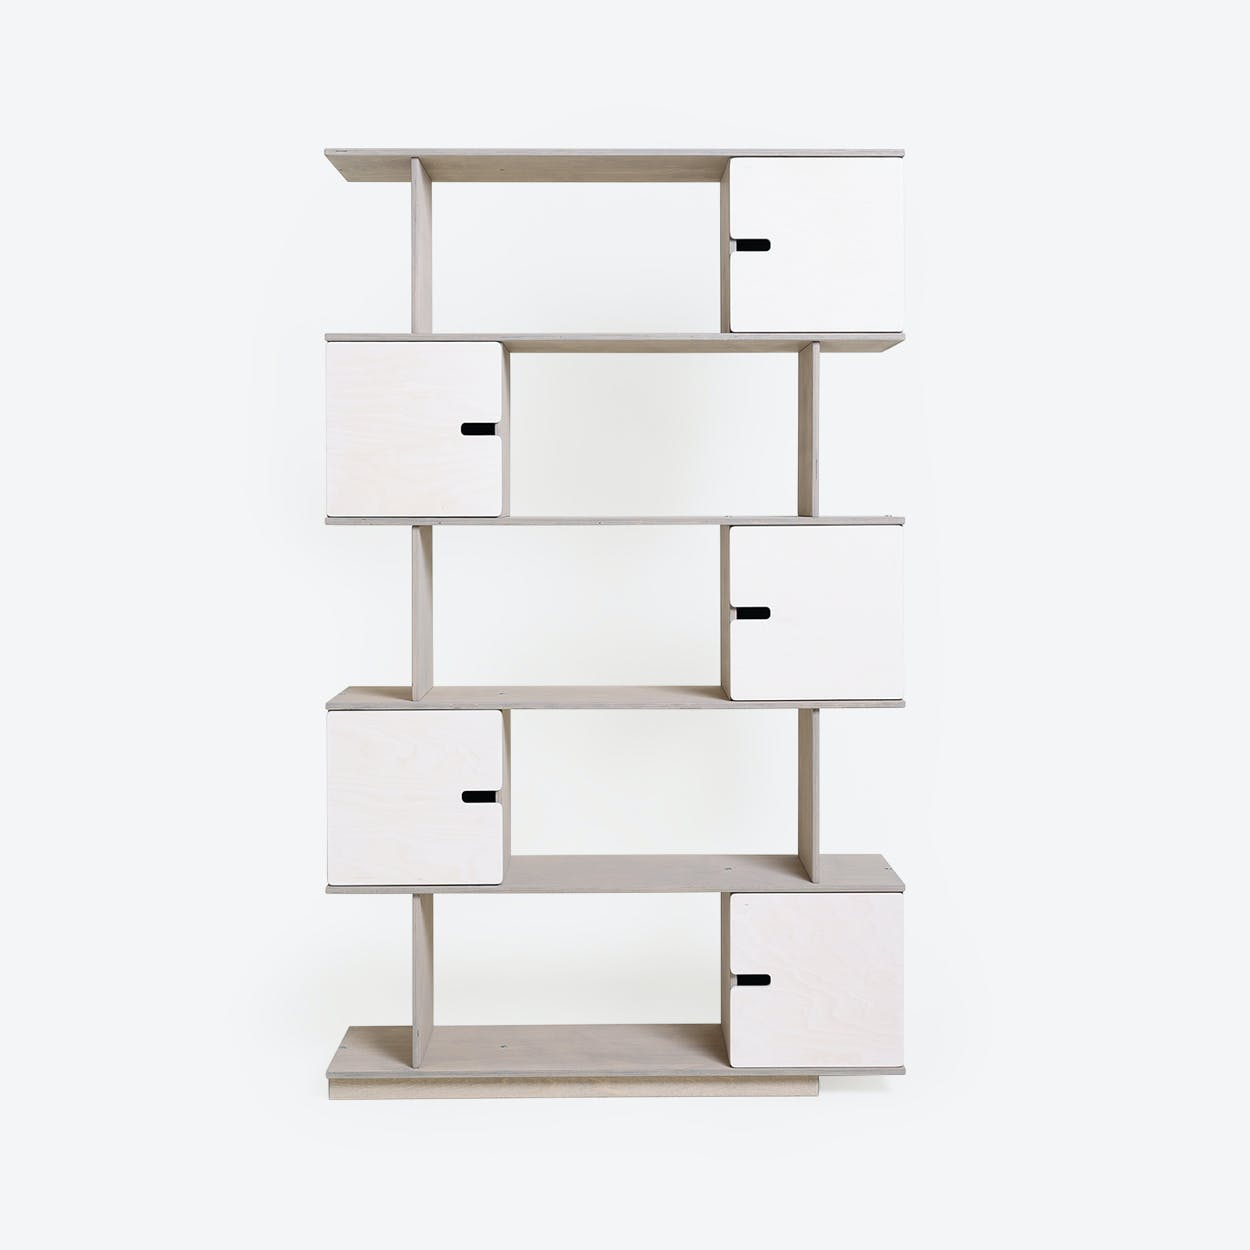 Shelf PIX 5-Levels in Light Grey/White